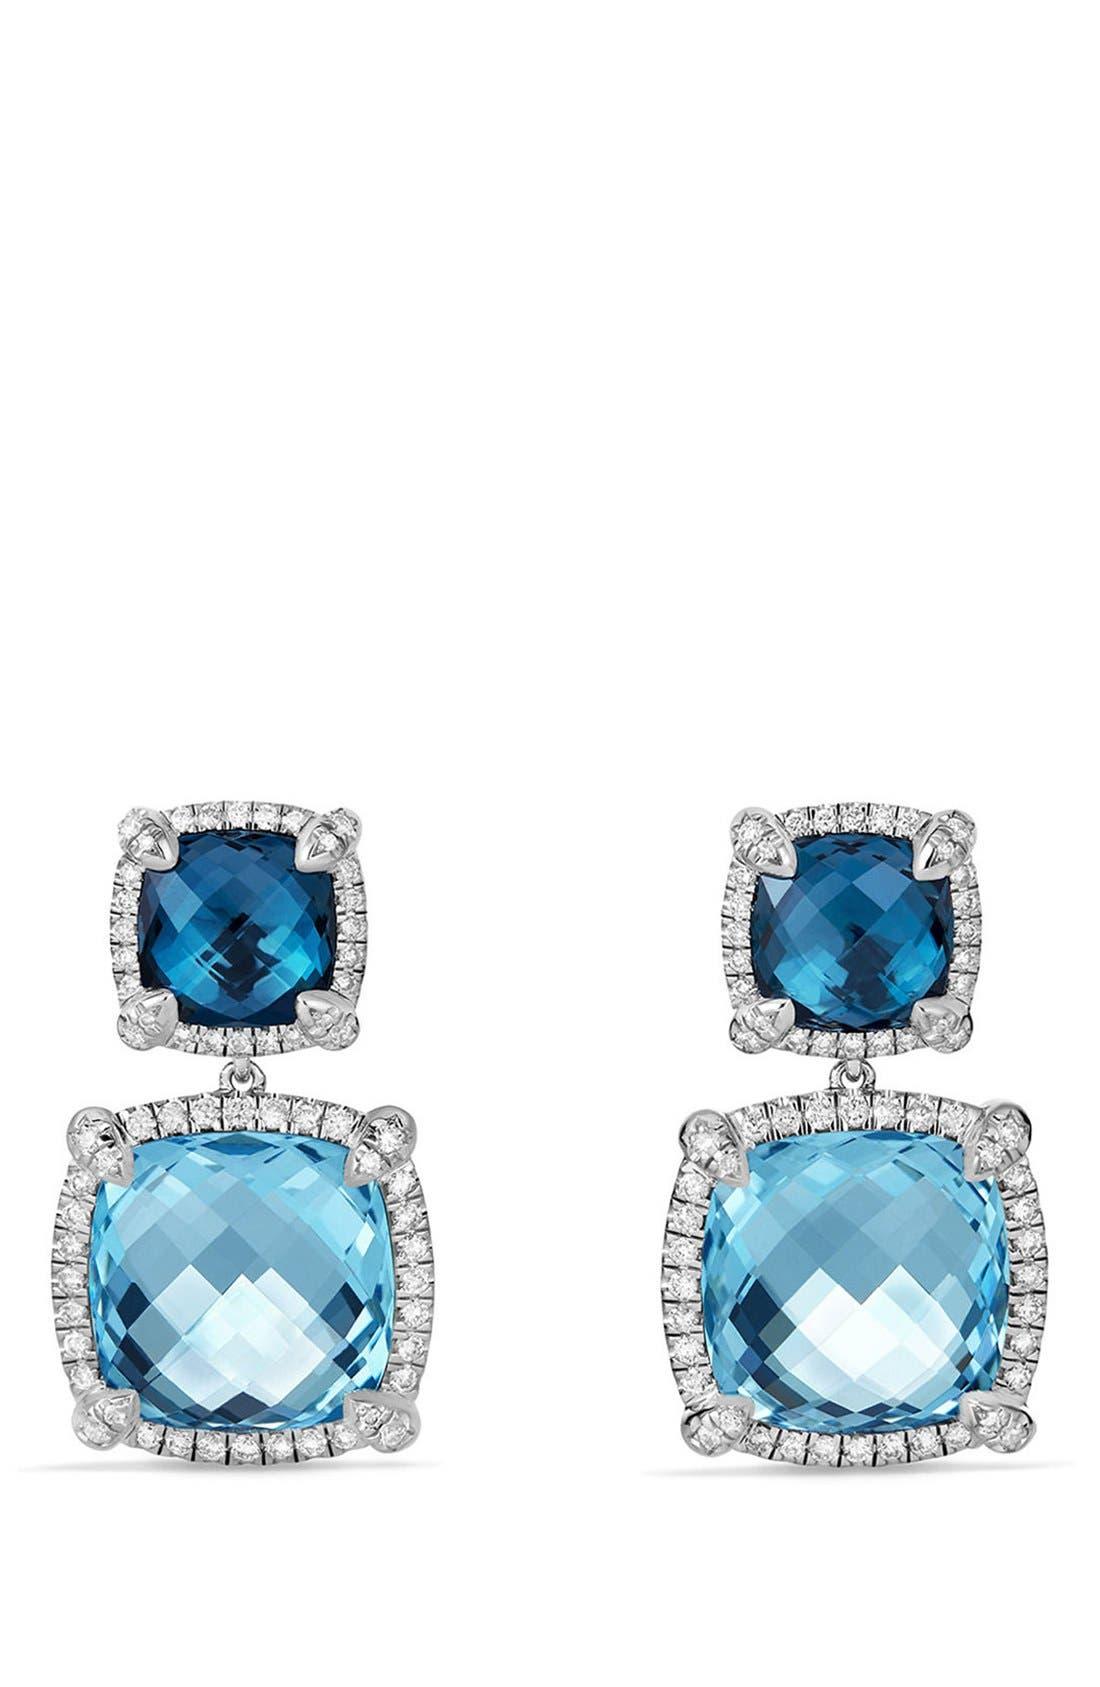 Main Image - David Yurman 'Châtelaine' Pavé Bezel Double Drop Earrings with Diamonds